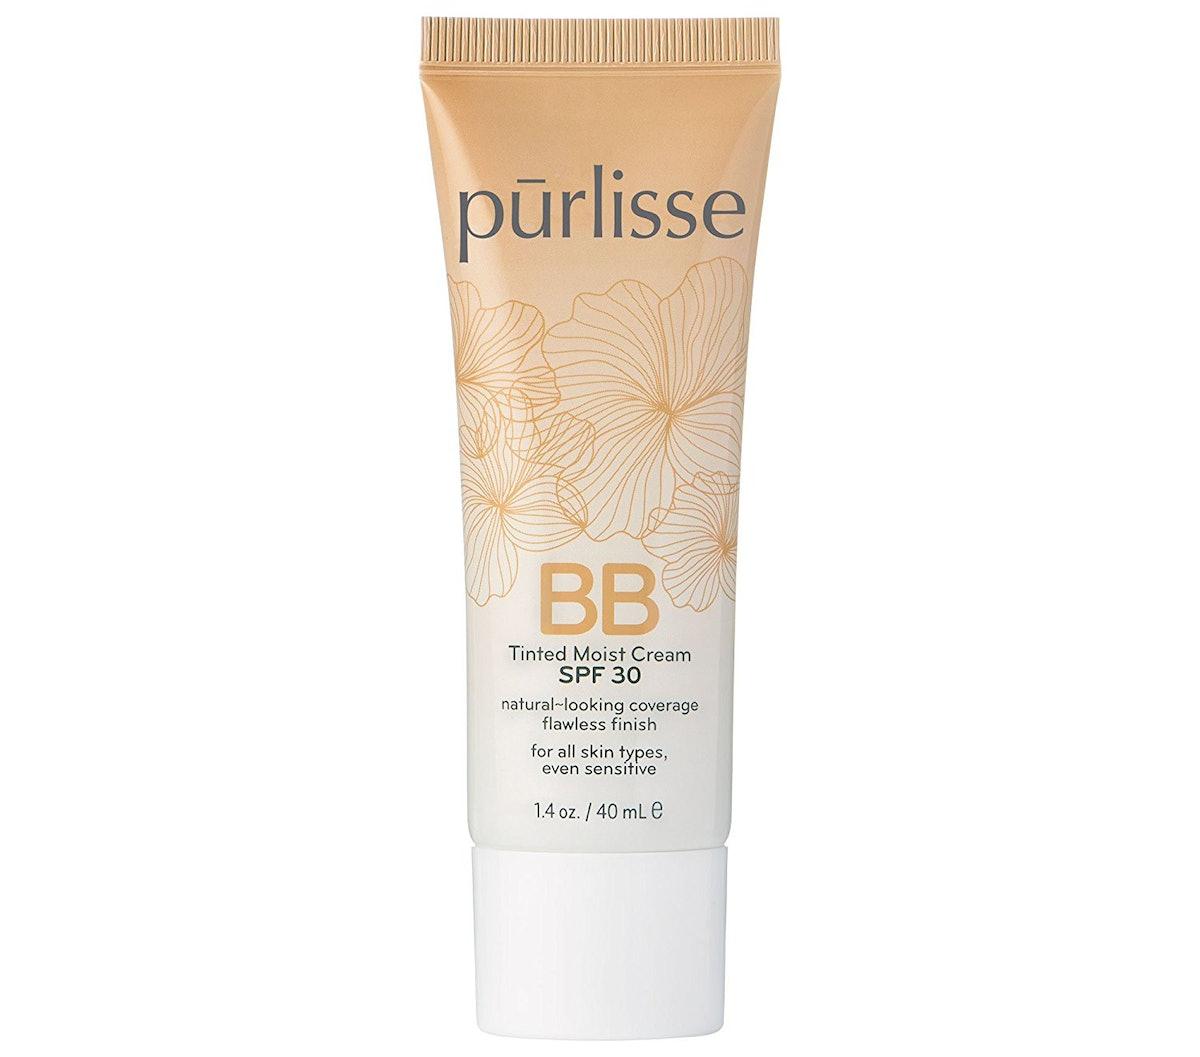 Purlisse BB Tinted Moist Cream